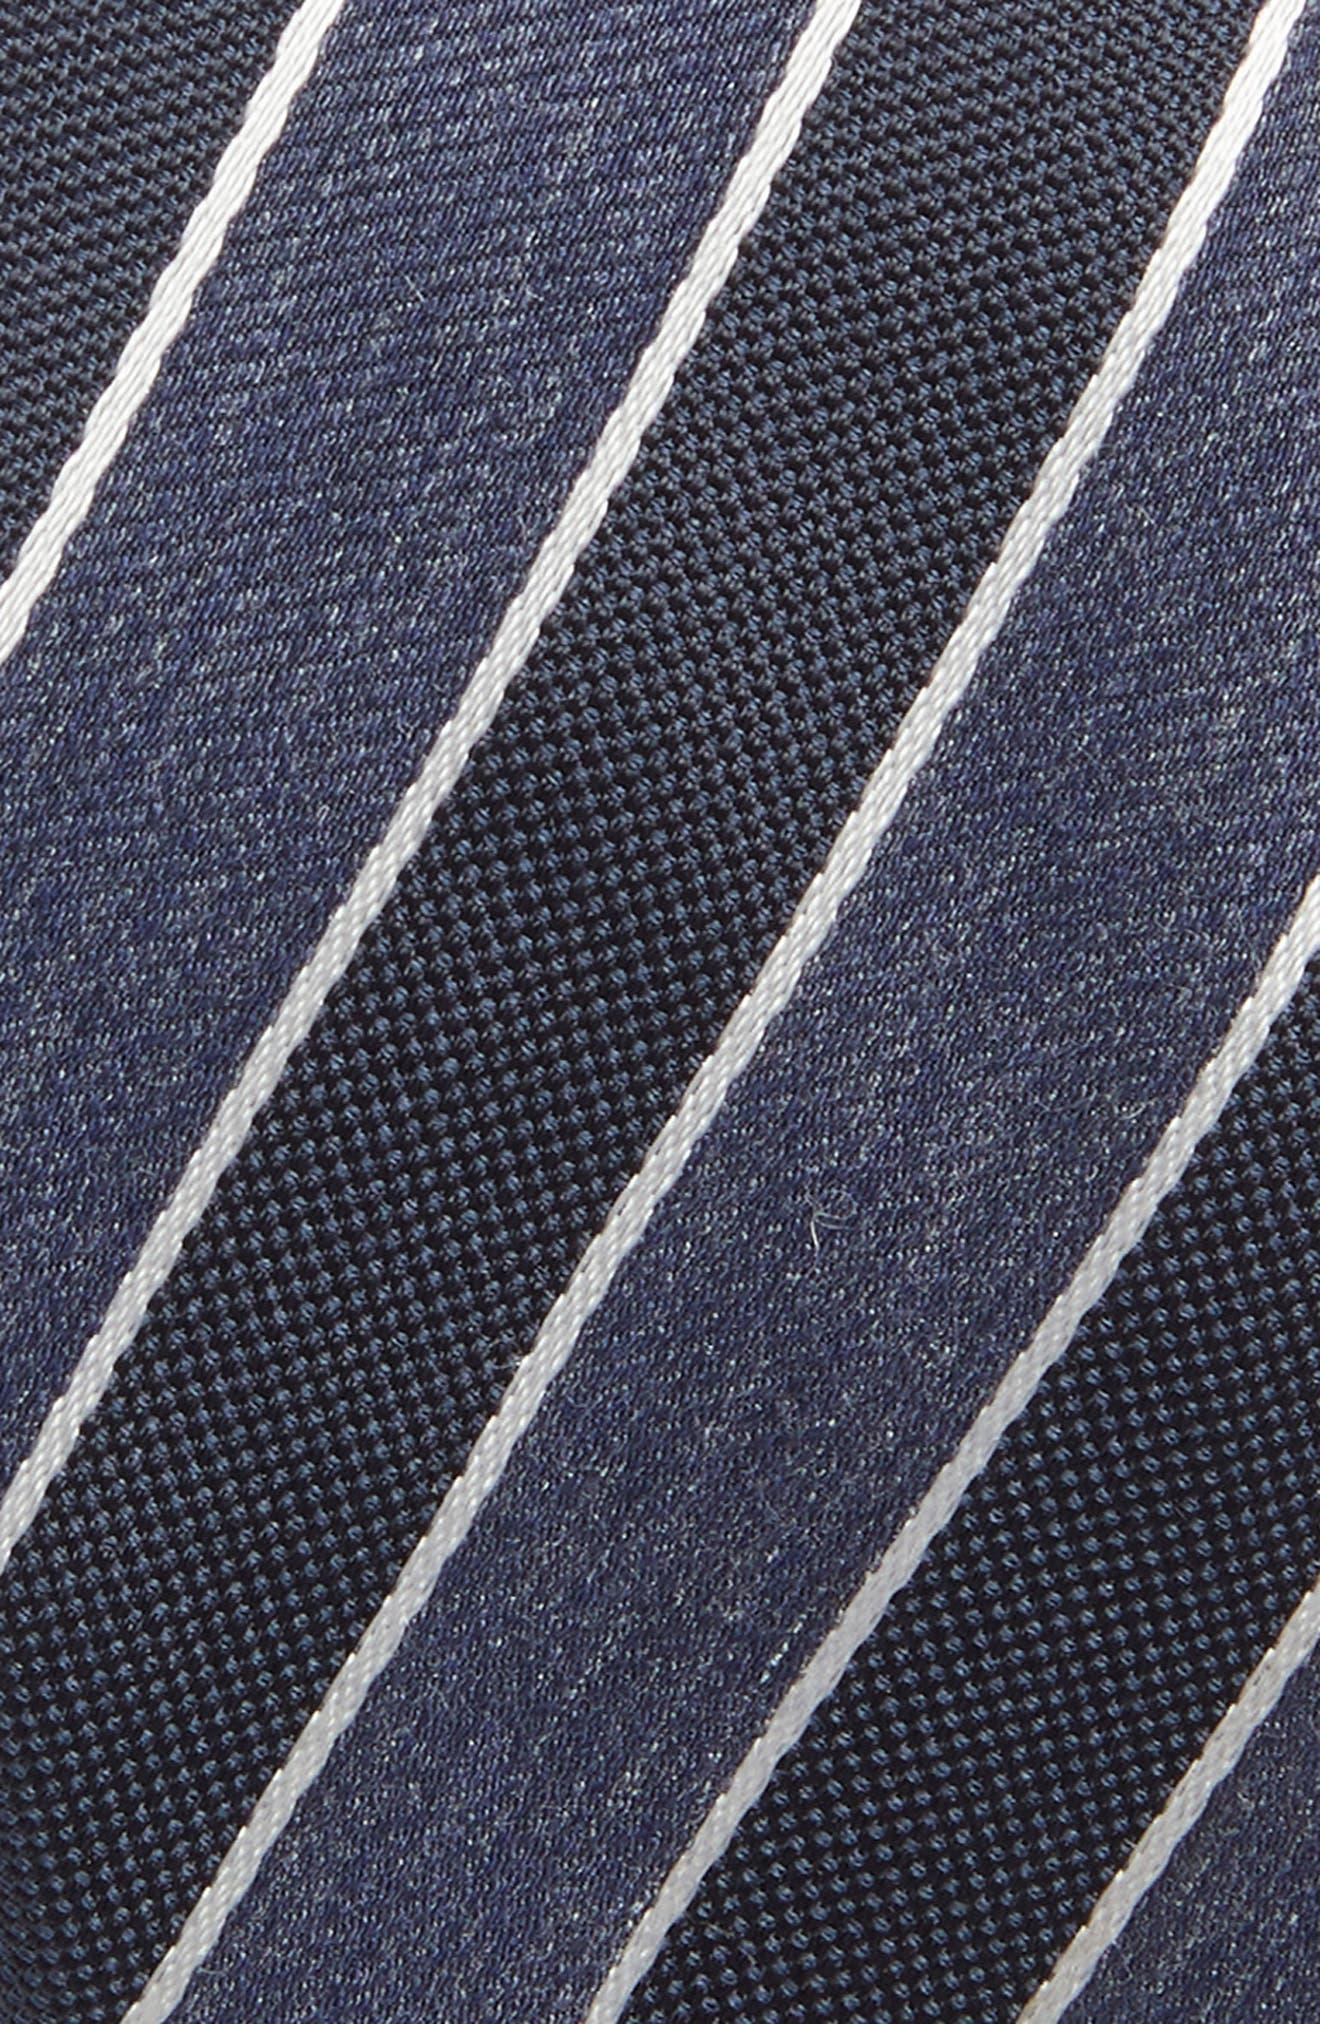 Stripe Silk Blend Tie,                             Alternate thumbnail 2, color,                             OPEN BLUE